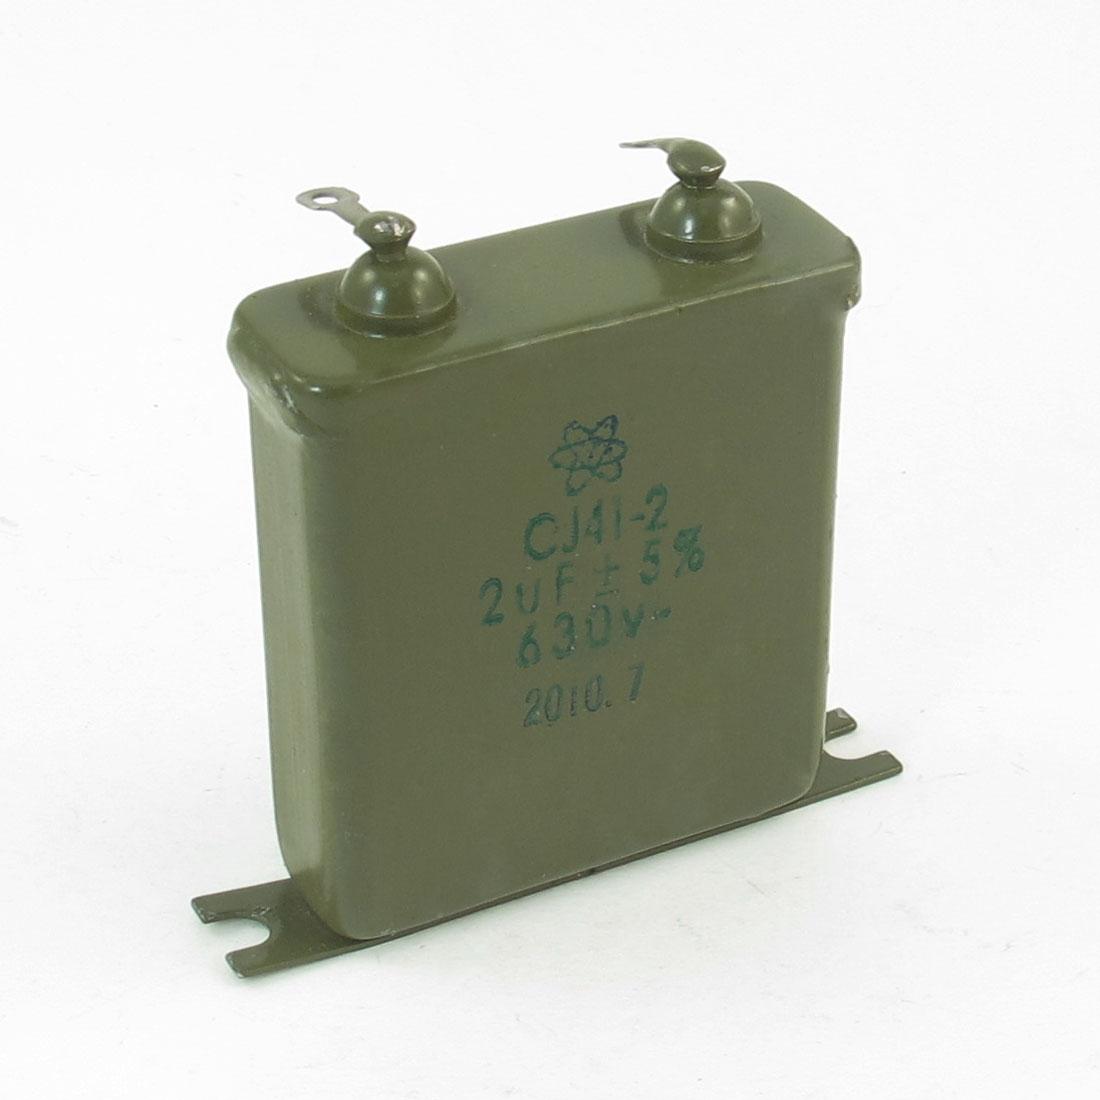 CJ41-2 2uF 630V 5% Metal Shell Solder Lug Terminals Paper Capacitor